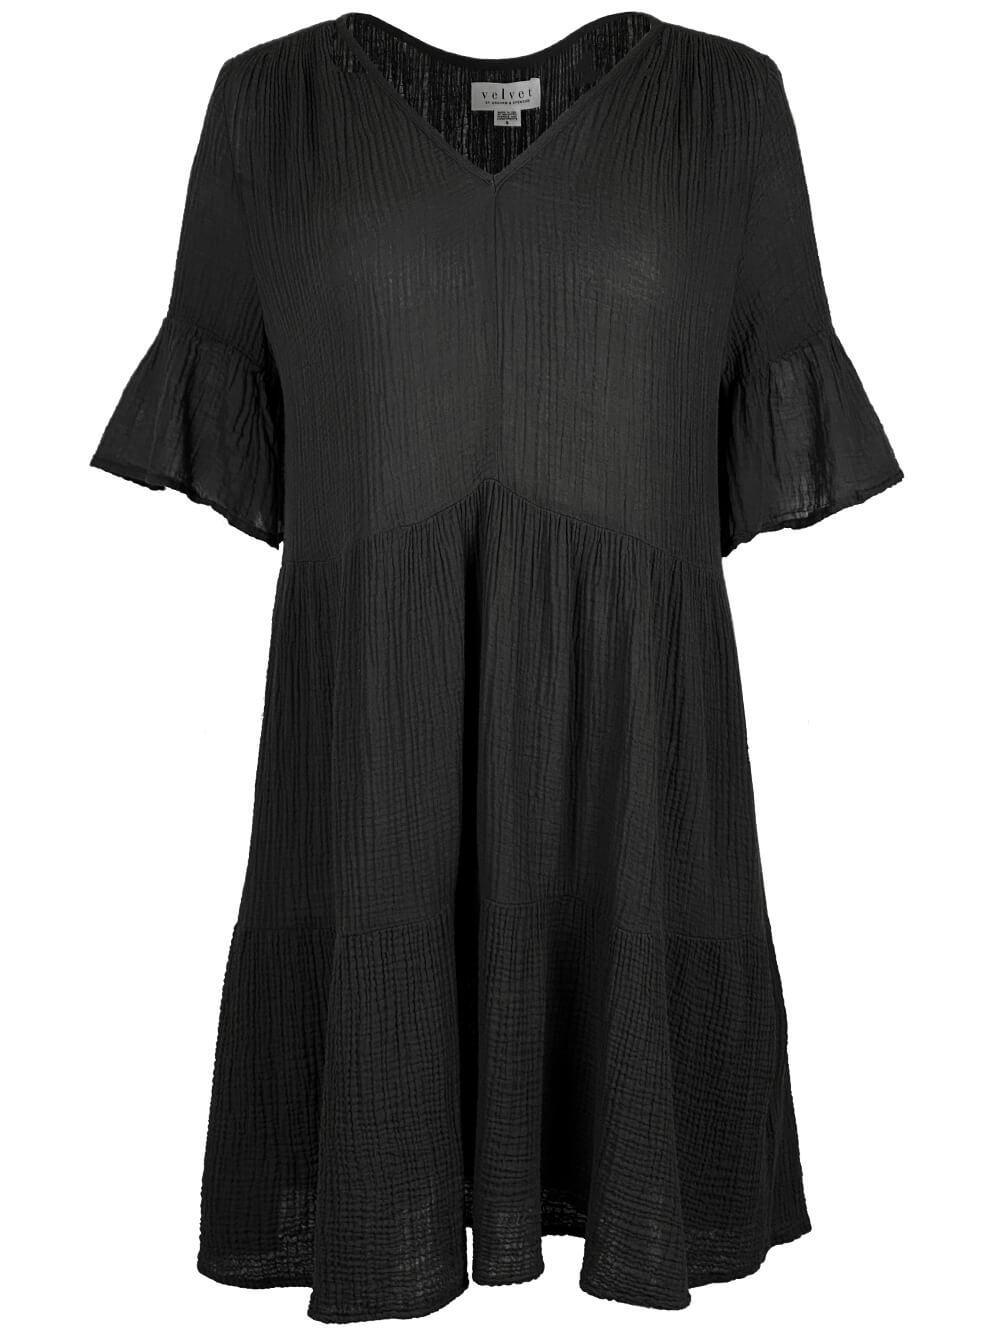 Tiered Cotton Gauze Dress Item # BRIANNE04